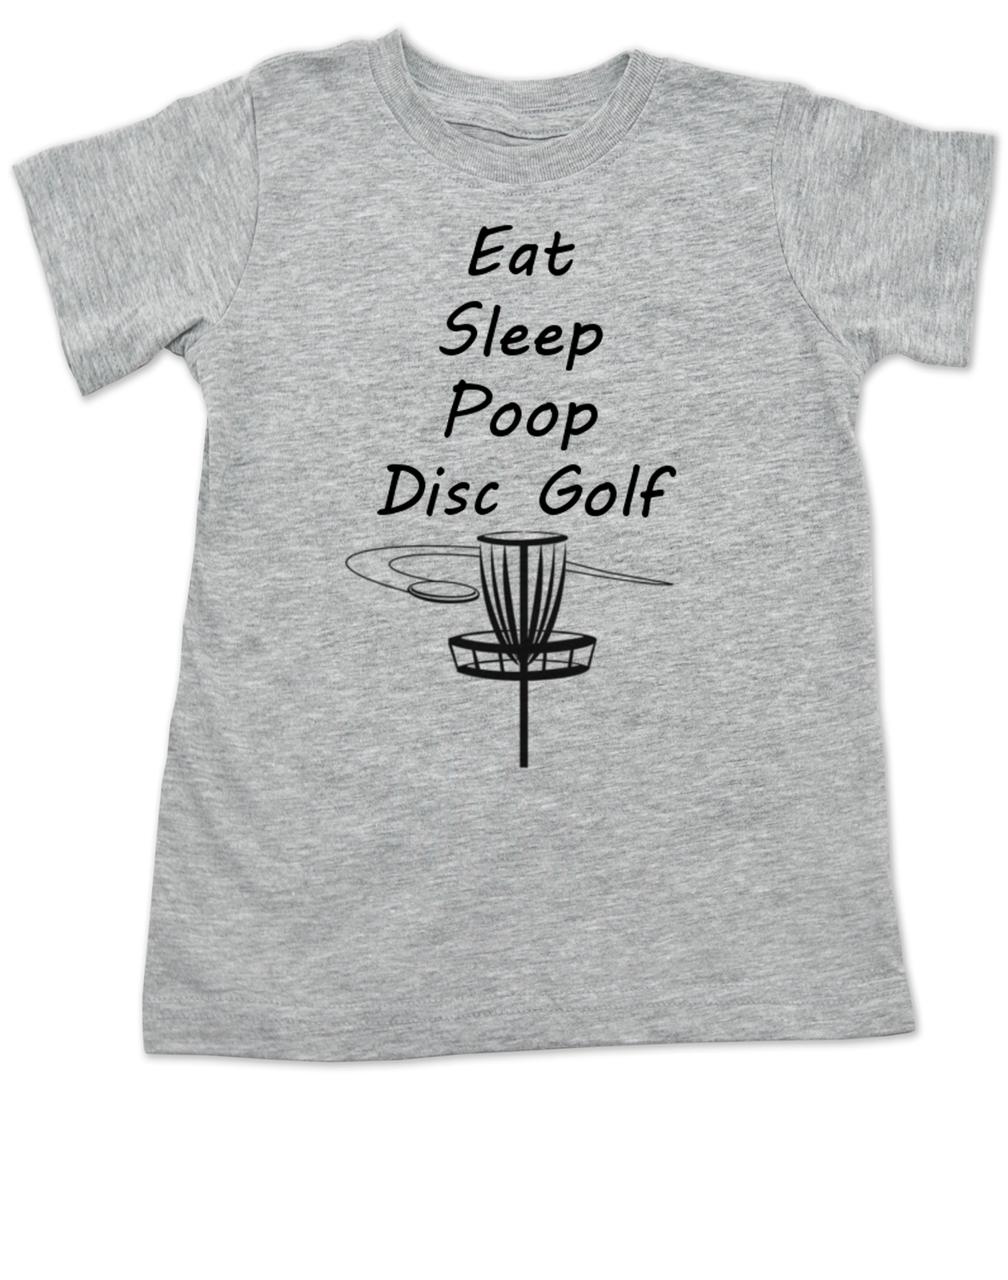 aa40a3c9 Eat Sleep Poop Disc Golf toddler shirt, Future Disc Golfer, Disc golf  toddler t